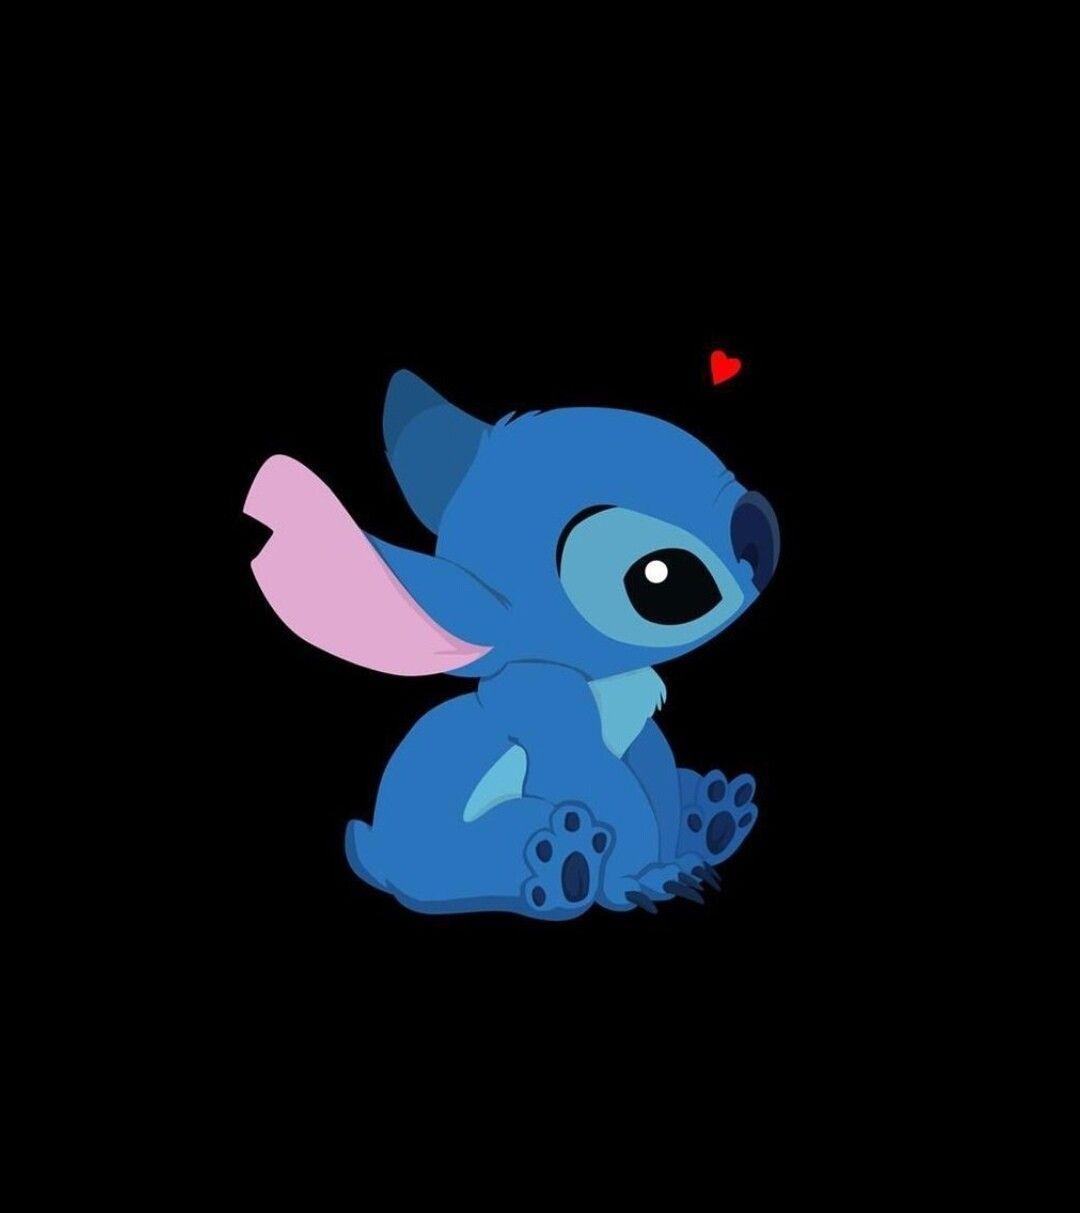 Stitch Mim S En 2020 Disney Fond Ecran Fond Ecran Disney